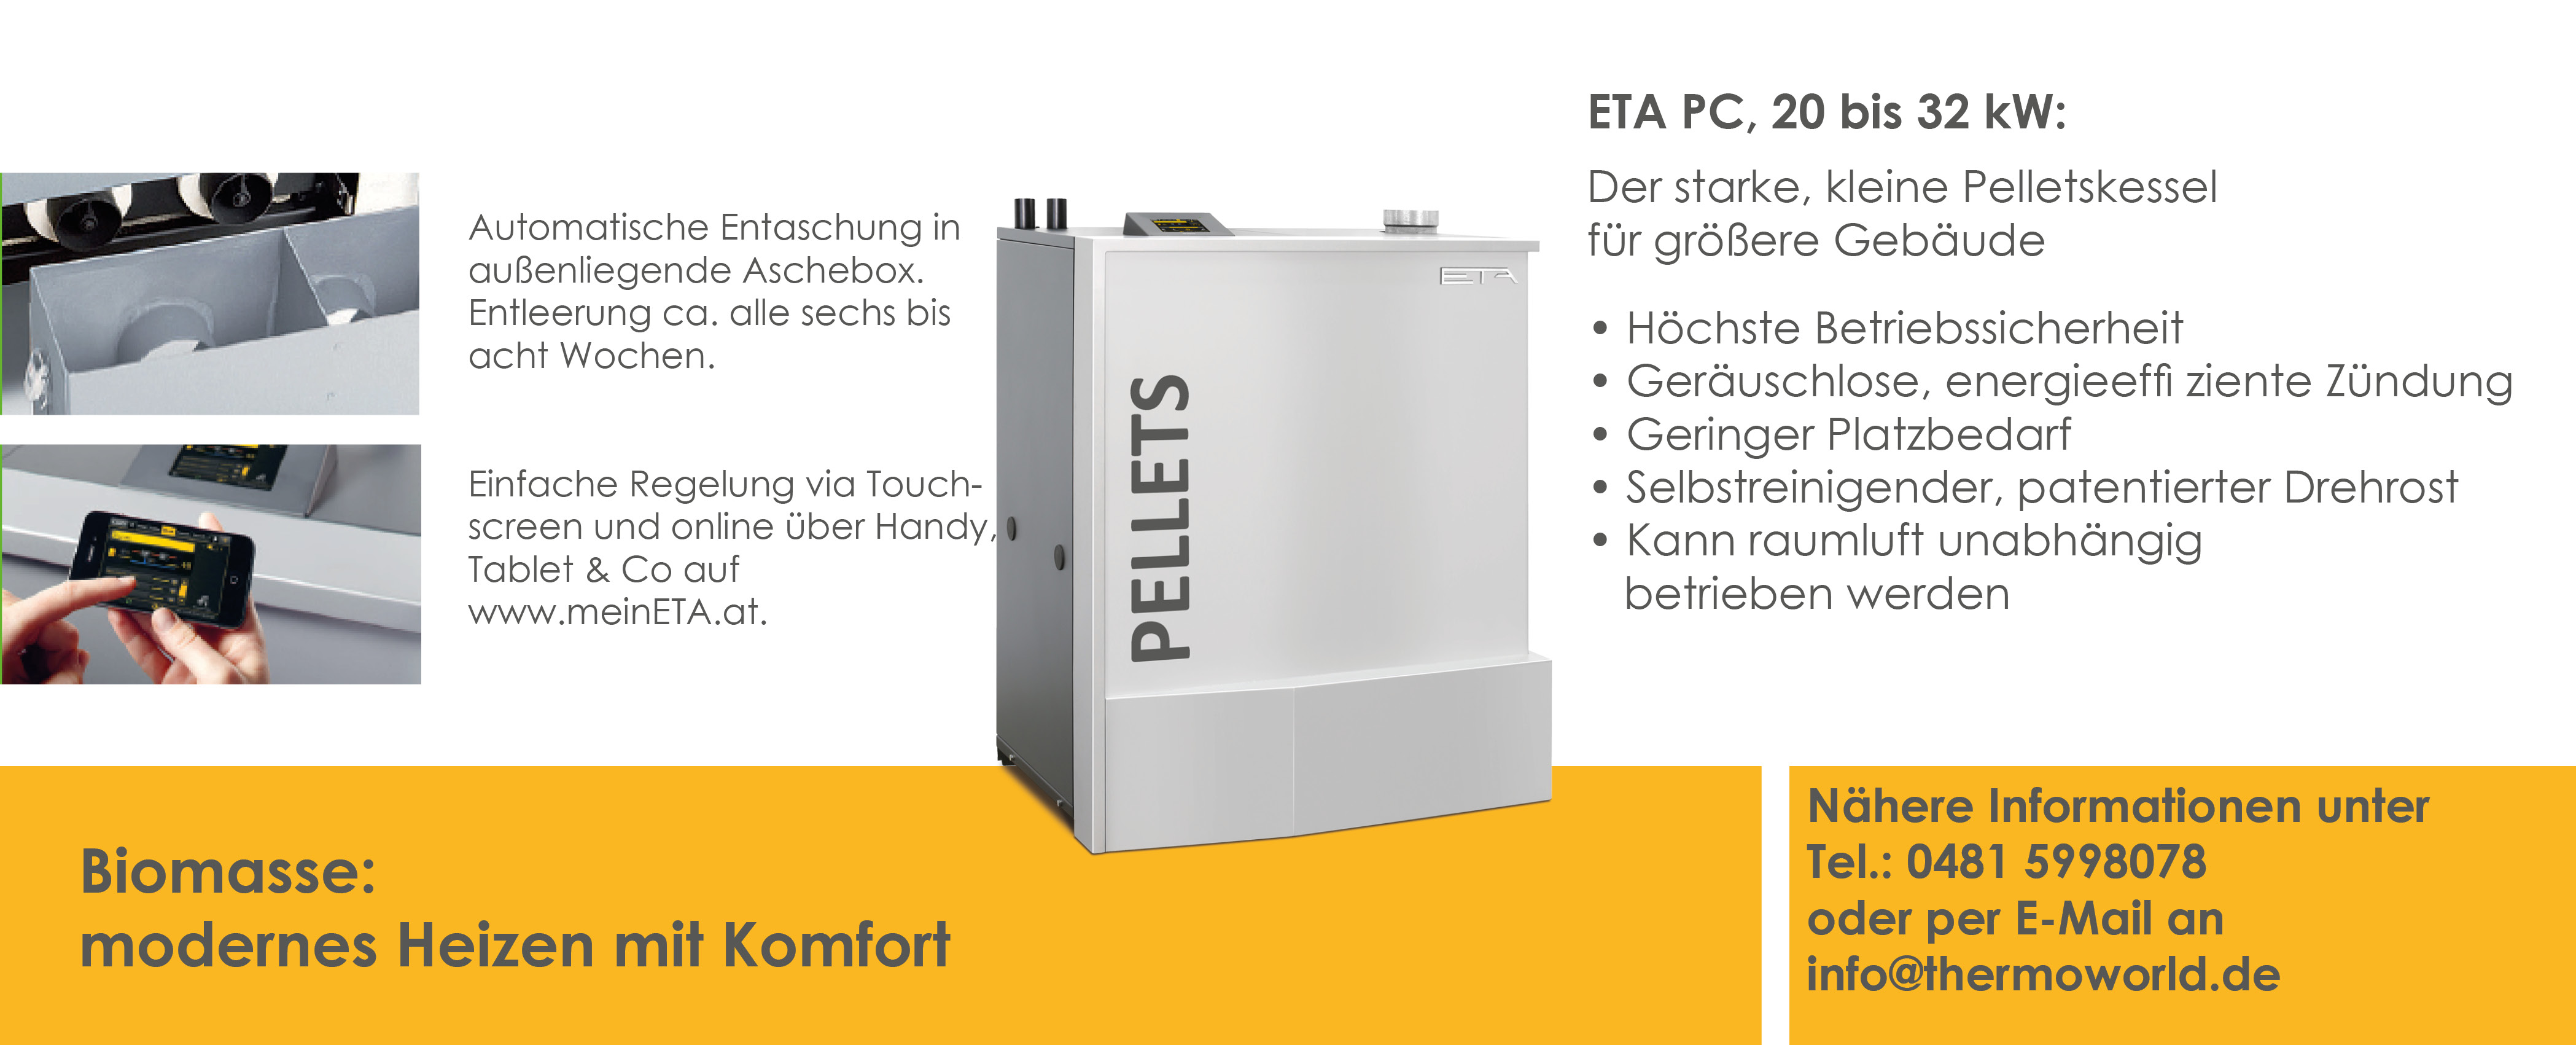 ETA-Kessel-PC5881c2a48270d